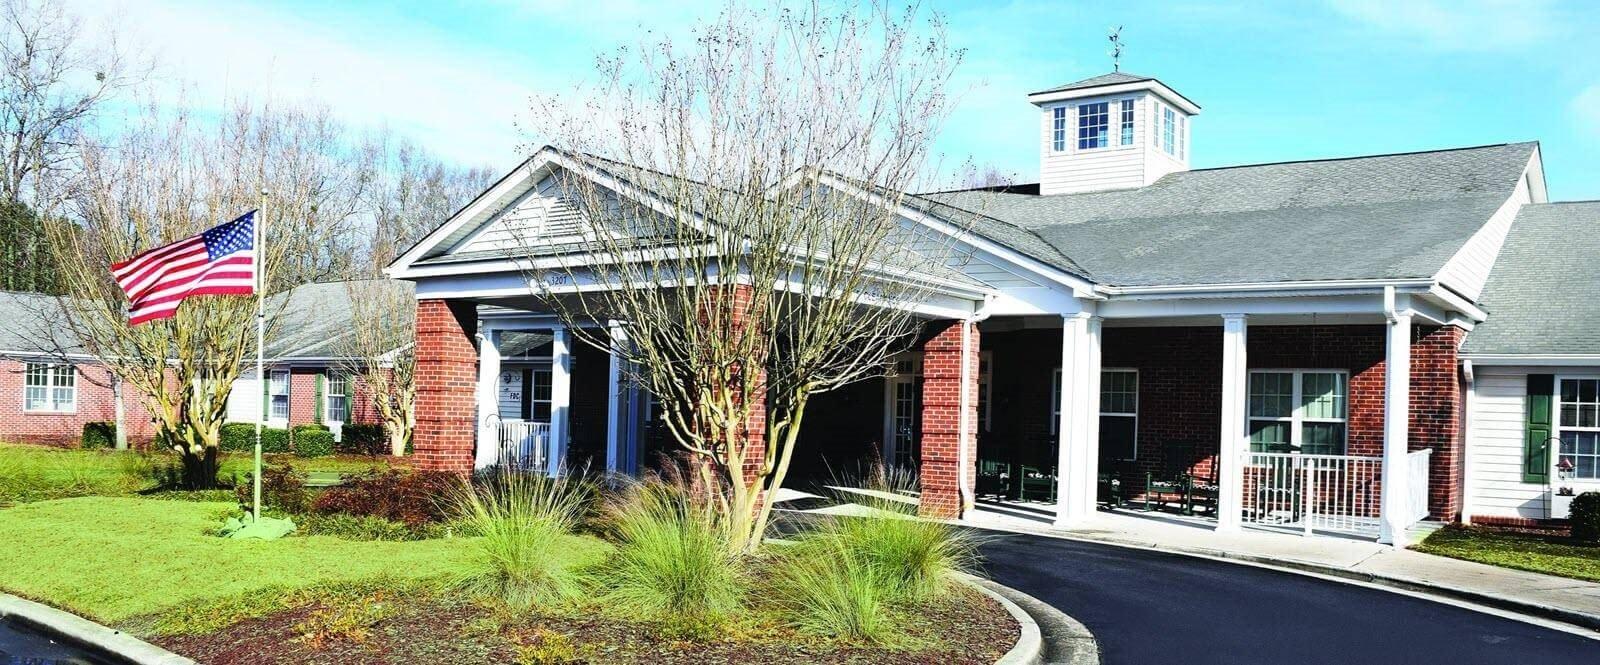 Main Entrance To Property at Spring Arbor of Kinston, Kinston, NC, 28504